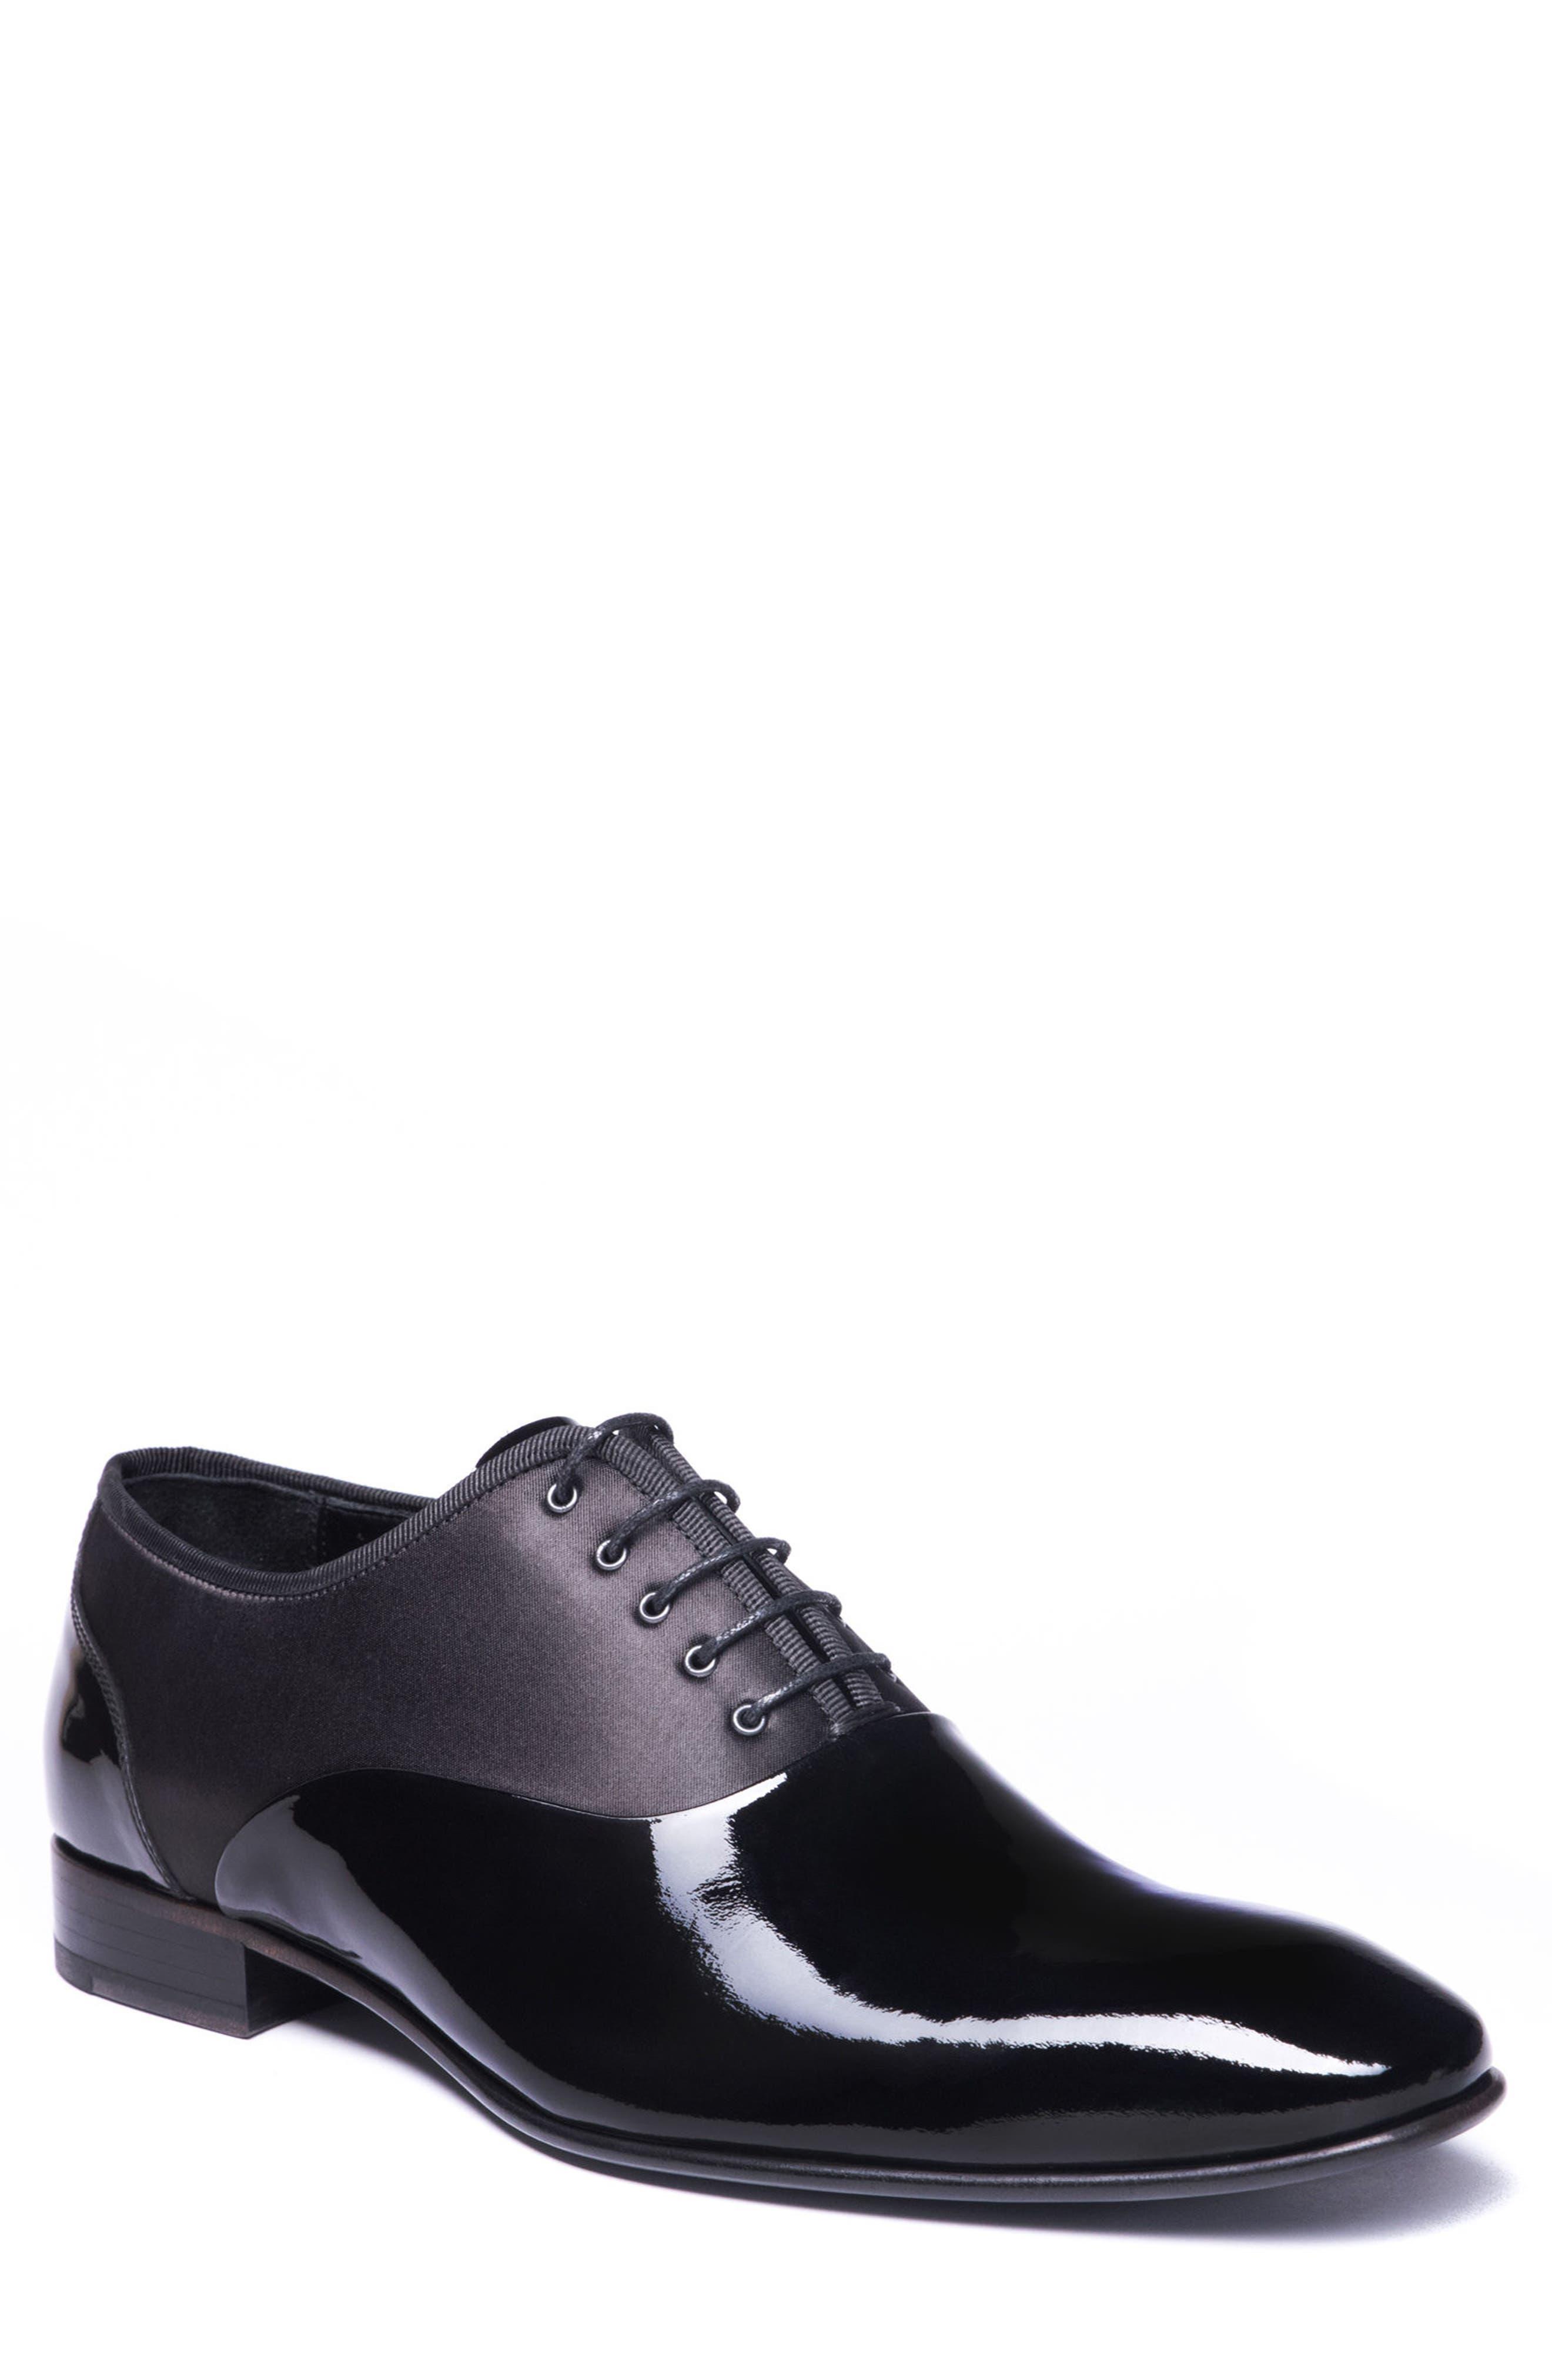 Stefano Plain Toe Oxford,                         Main,                         color, BLACK LEATHER